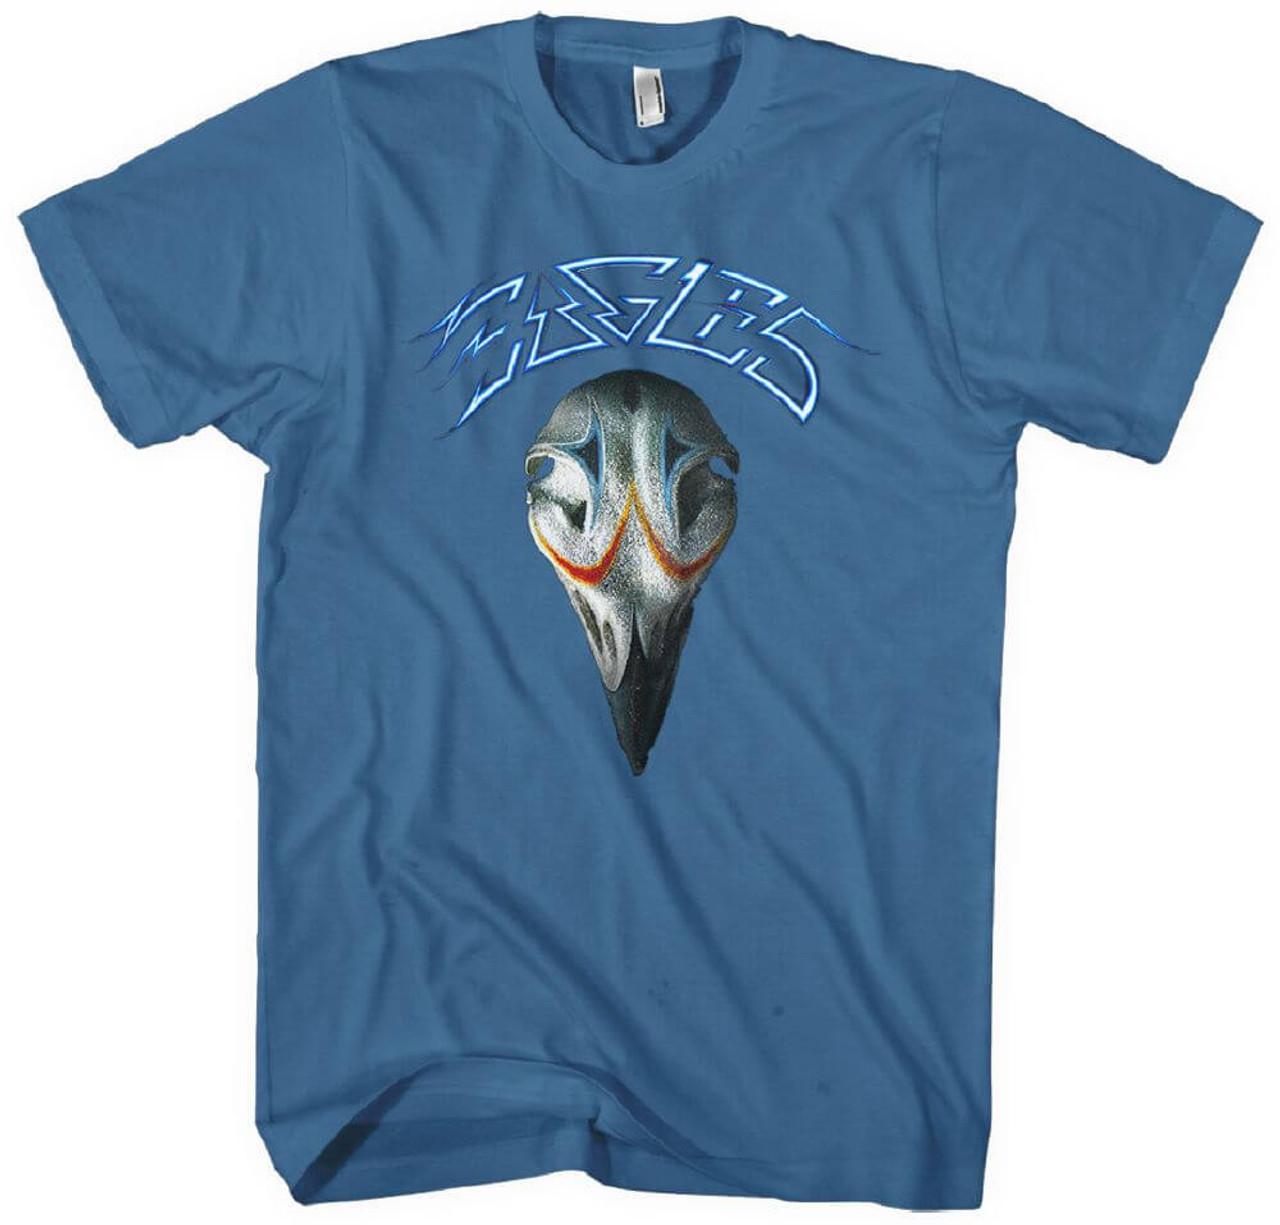 Eagles Classic Rock n Roll Band T-shirt - Greatest Hits Album Cover Artwork   239f47e13